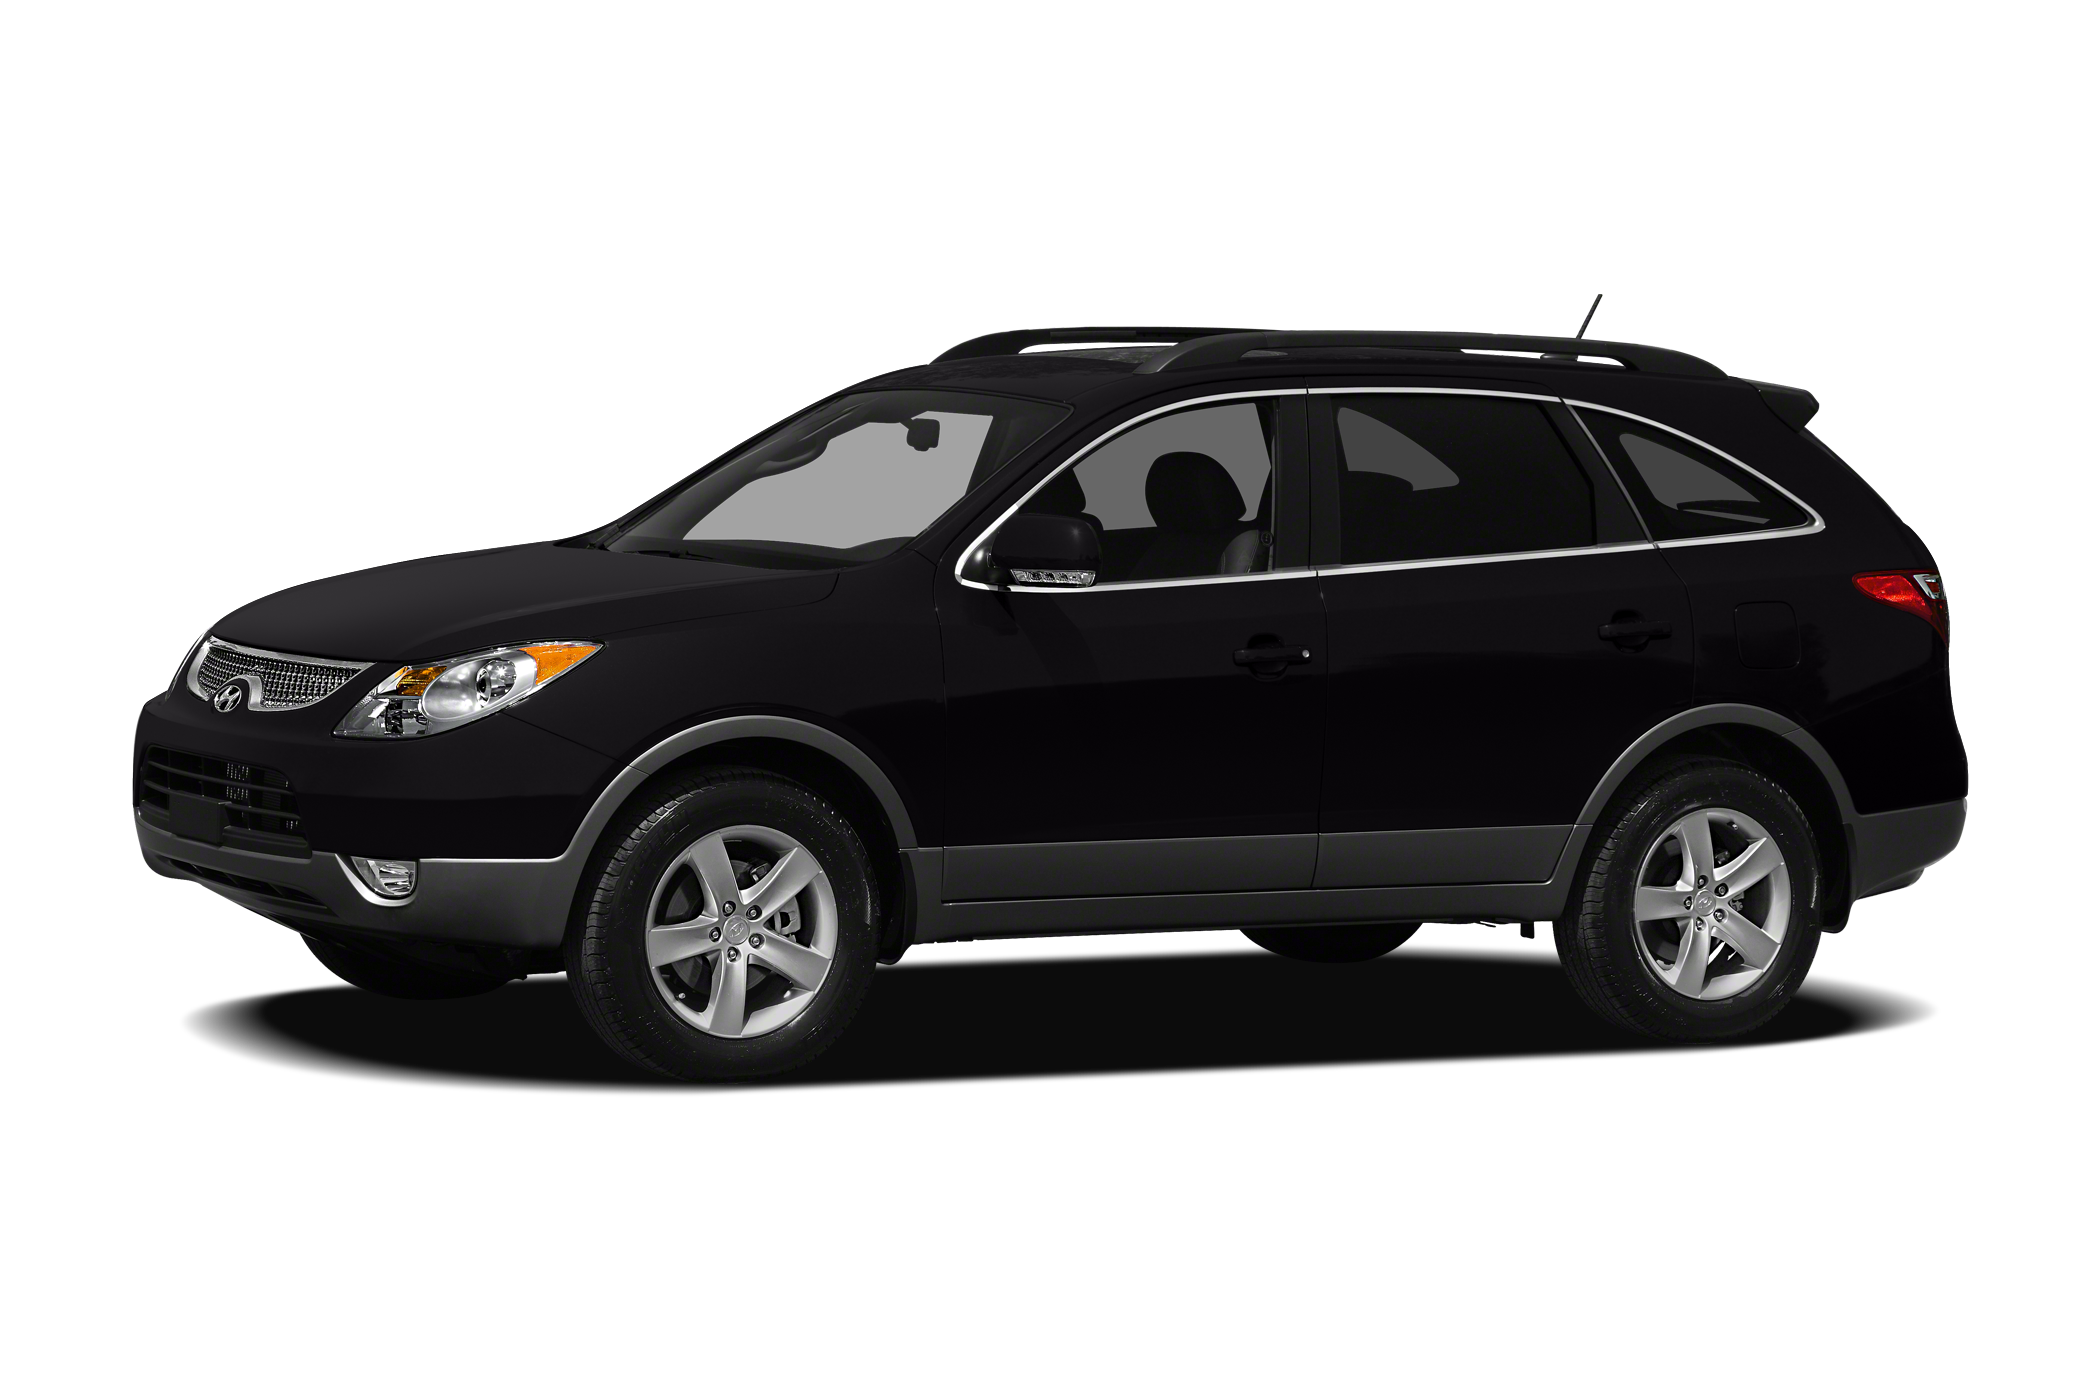 2010 Hyundai Elantra Price Photos Reviews Amp Features 2017 2018 Best Cars Reviews